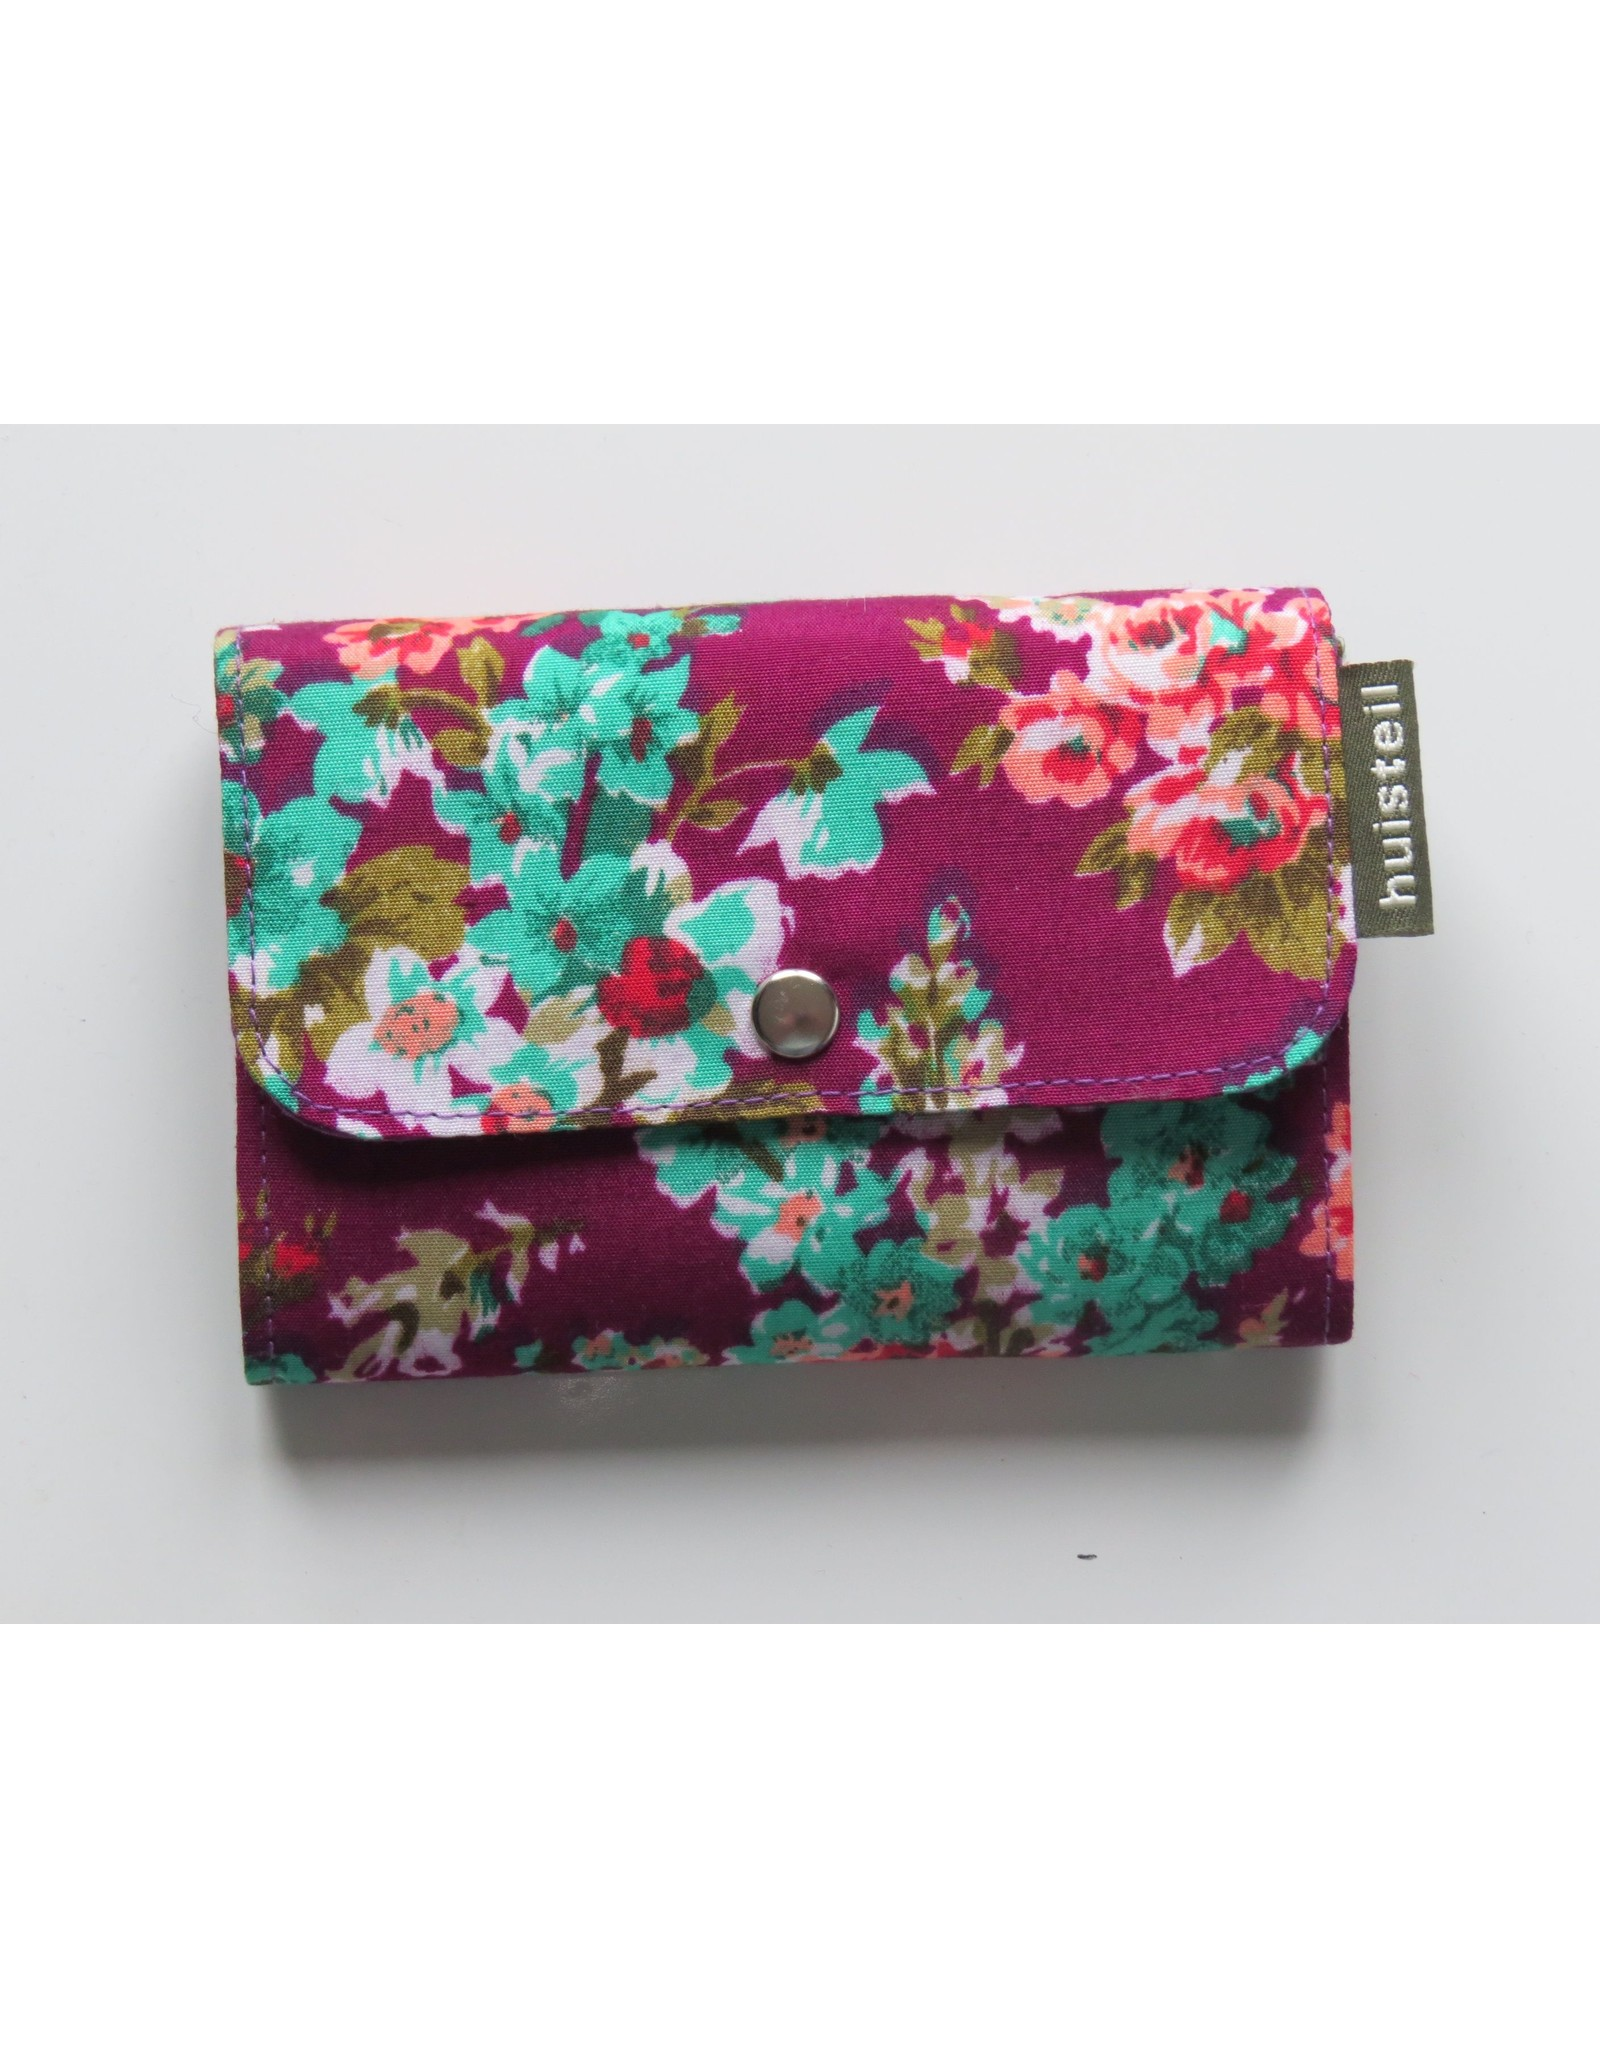 Huisteil Kleine retro portemonnee - paars gebloemd